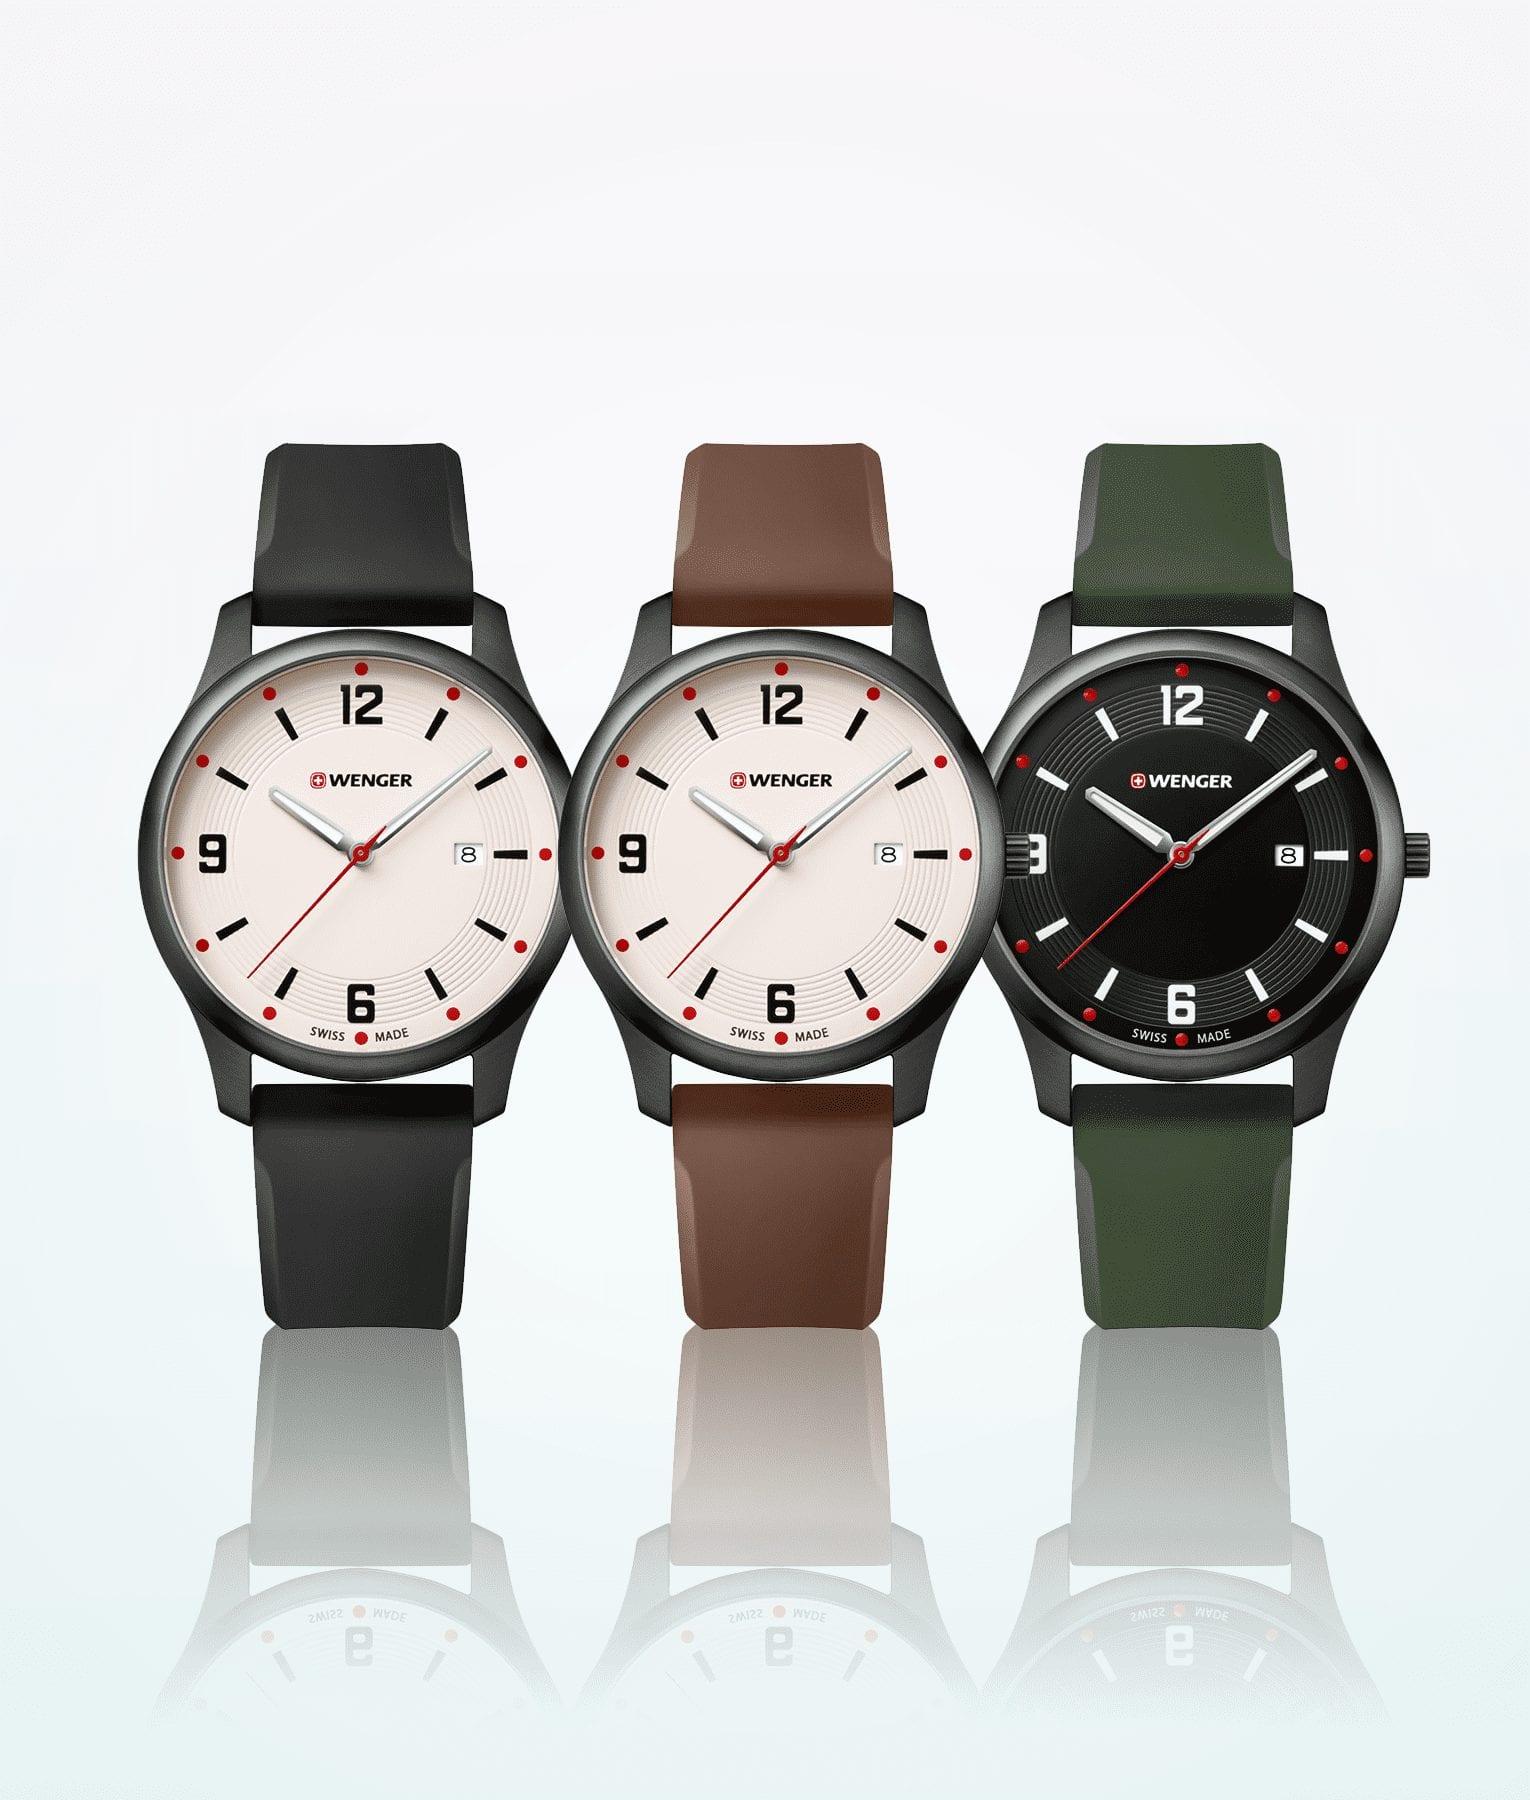 wenger-urban-active-men-wristwatch